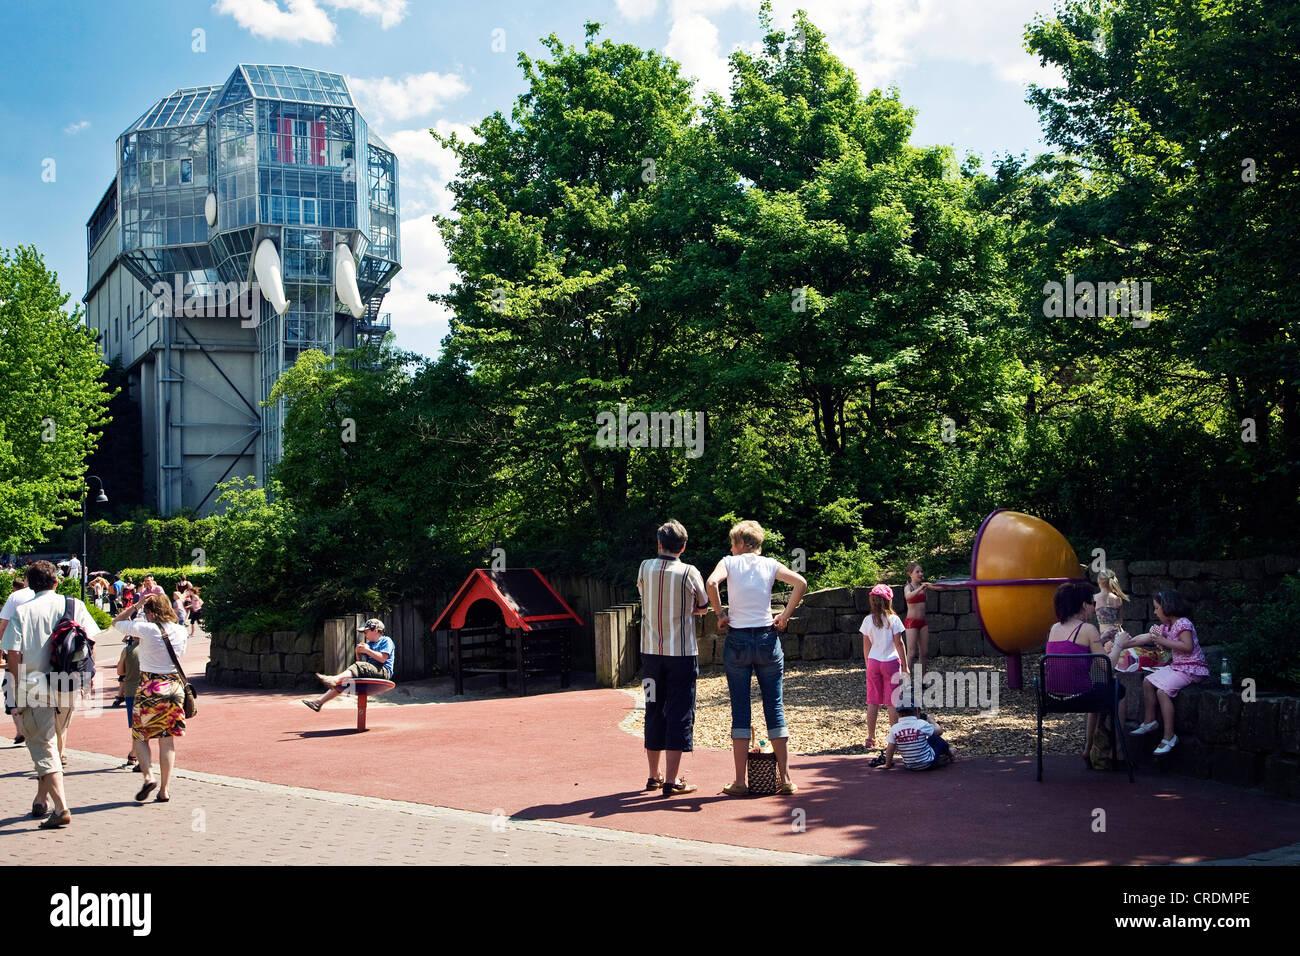 visitors in the Maximilianpark, Germany, North Rhine-Westphalia, Ruhr Area, Hamm - Stock Image